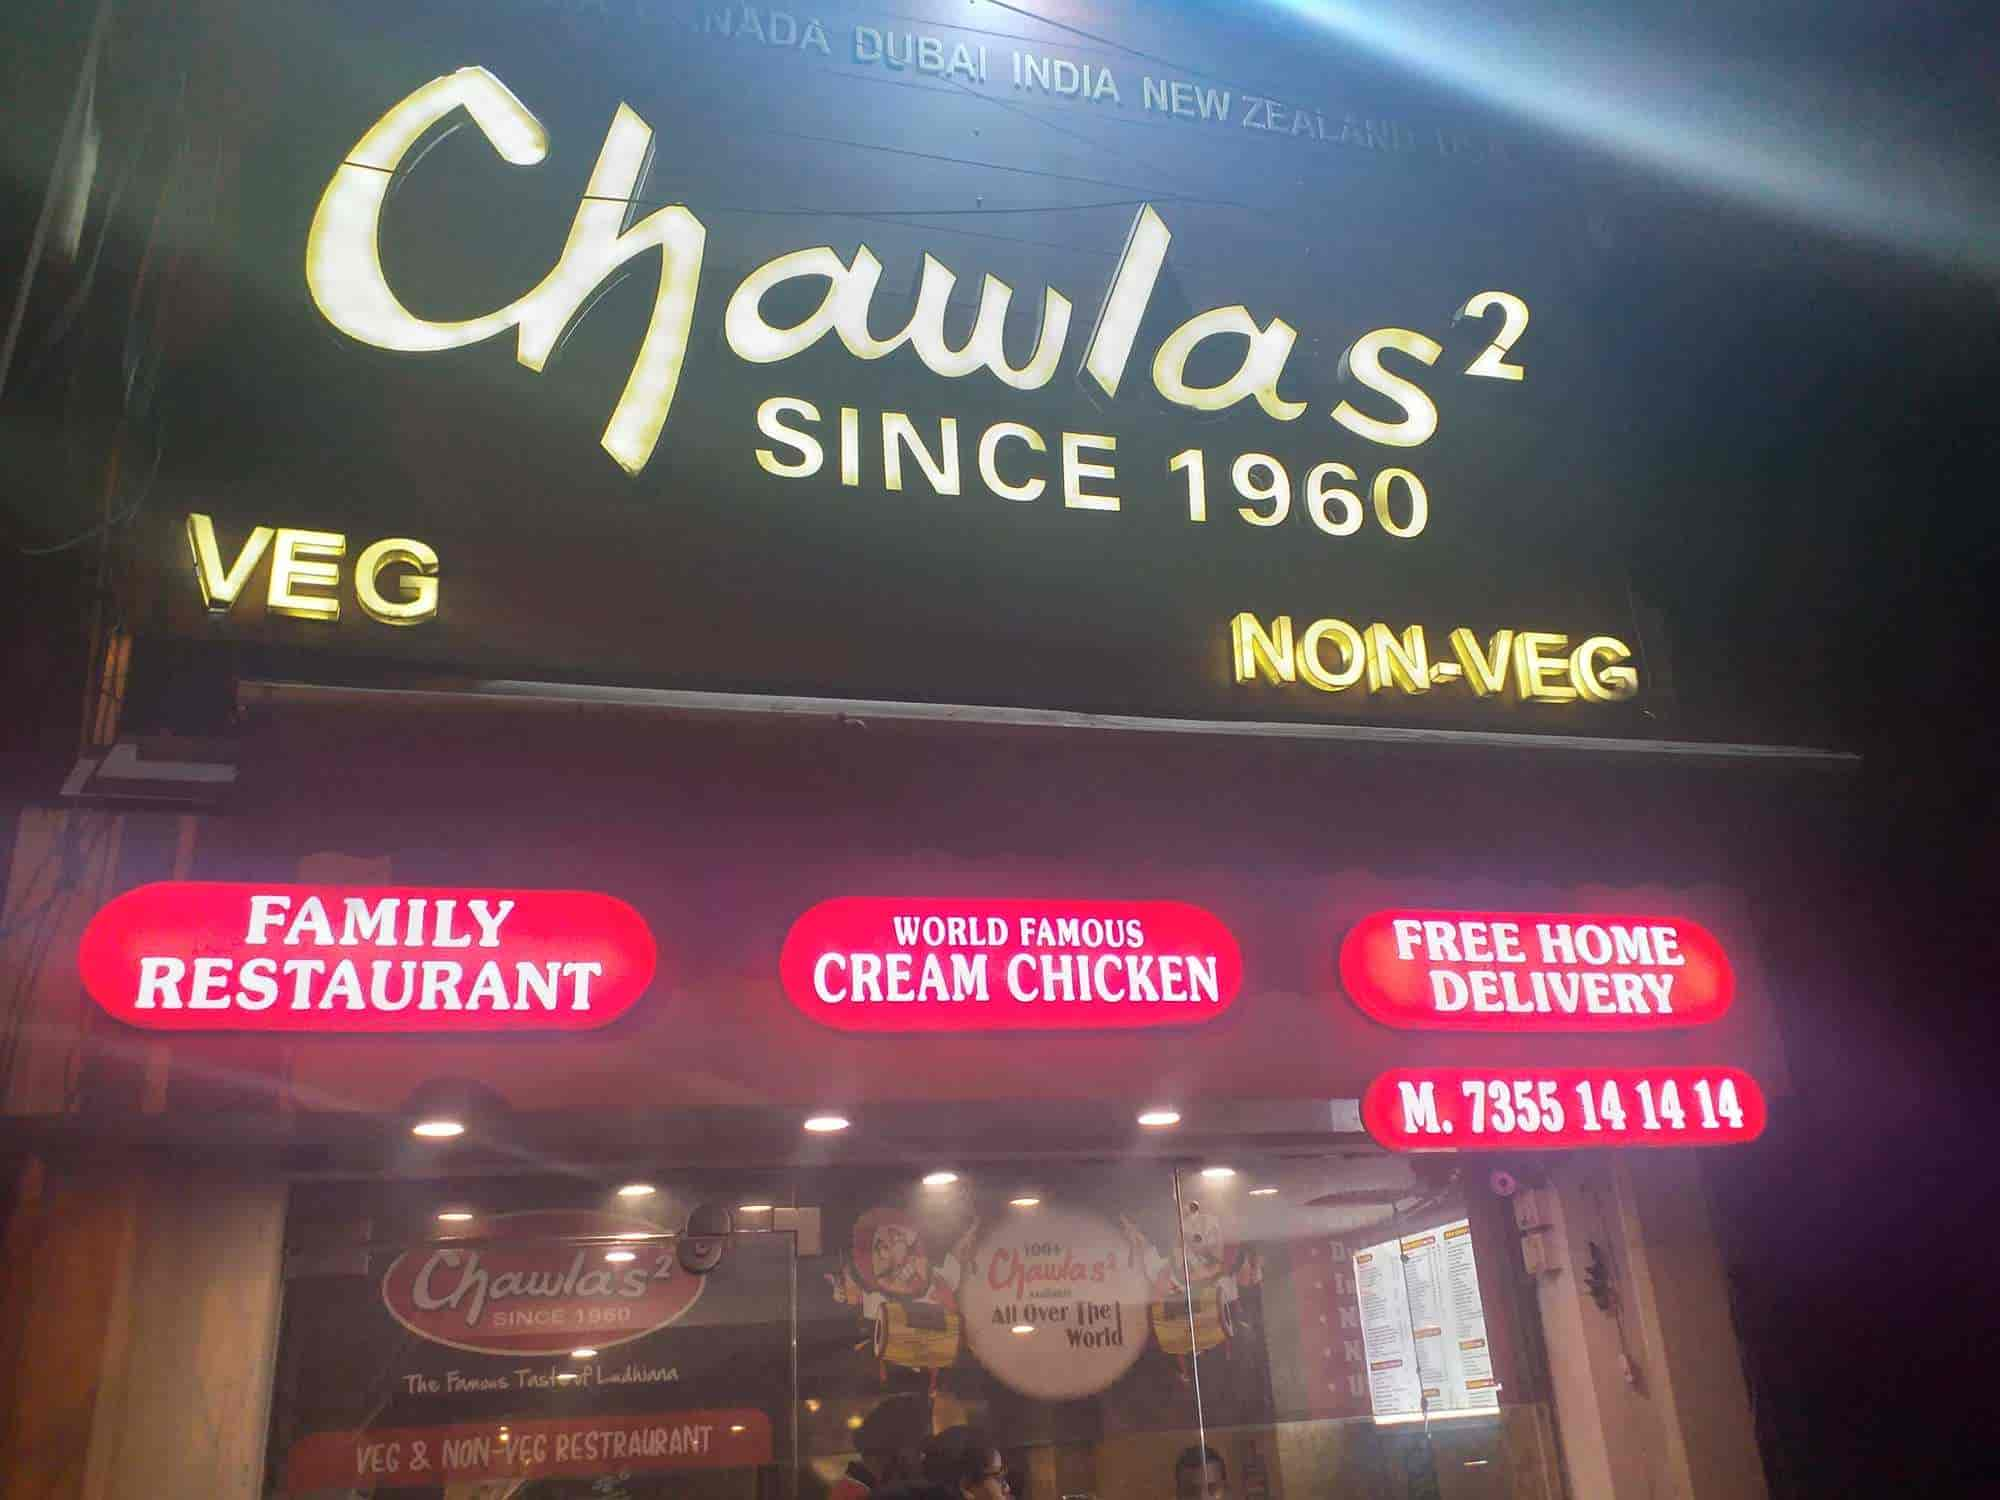 Top 100 Restaurants in Samrala Road - Best Restaurants near